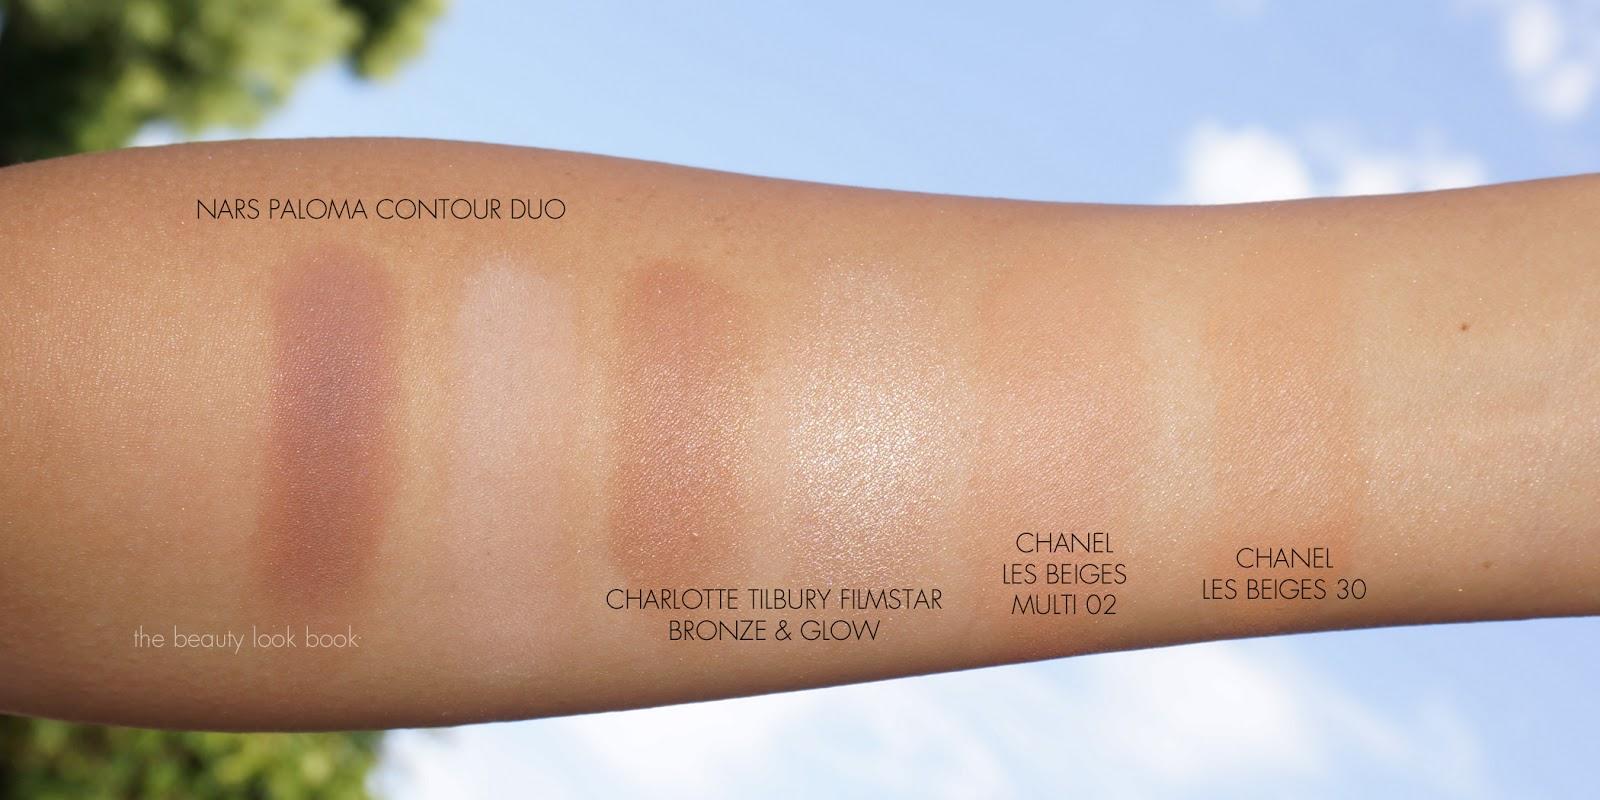 Charlotte Tilbury Filmstar Killer Cheekbones Set Nordstrom Anniversary Beauty Exclusive The Beauty Look Book